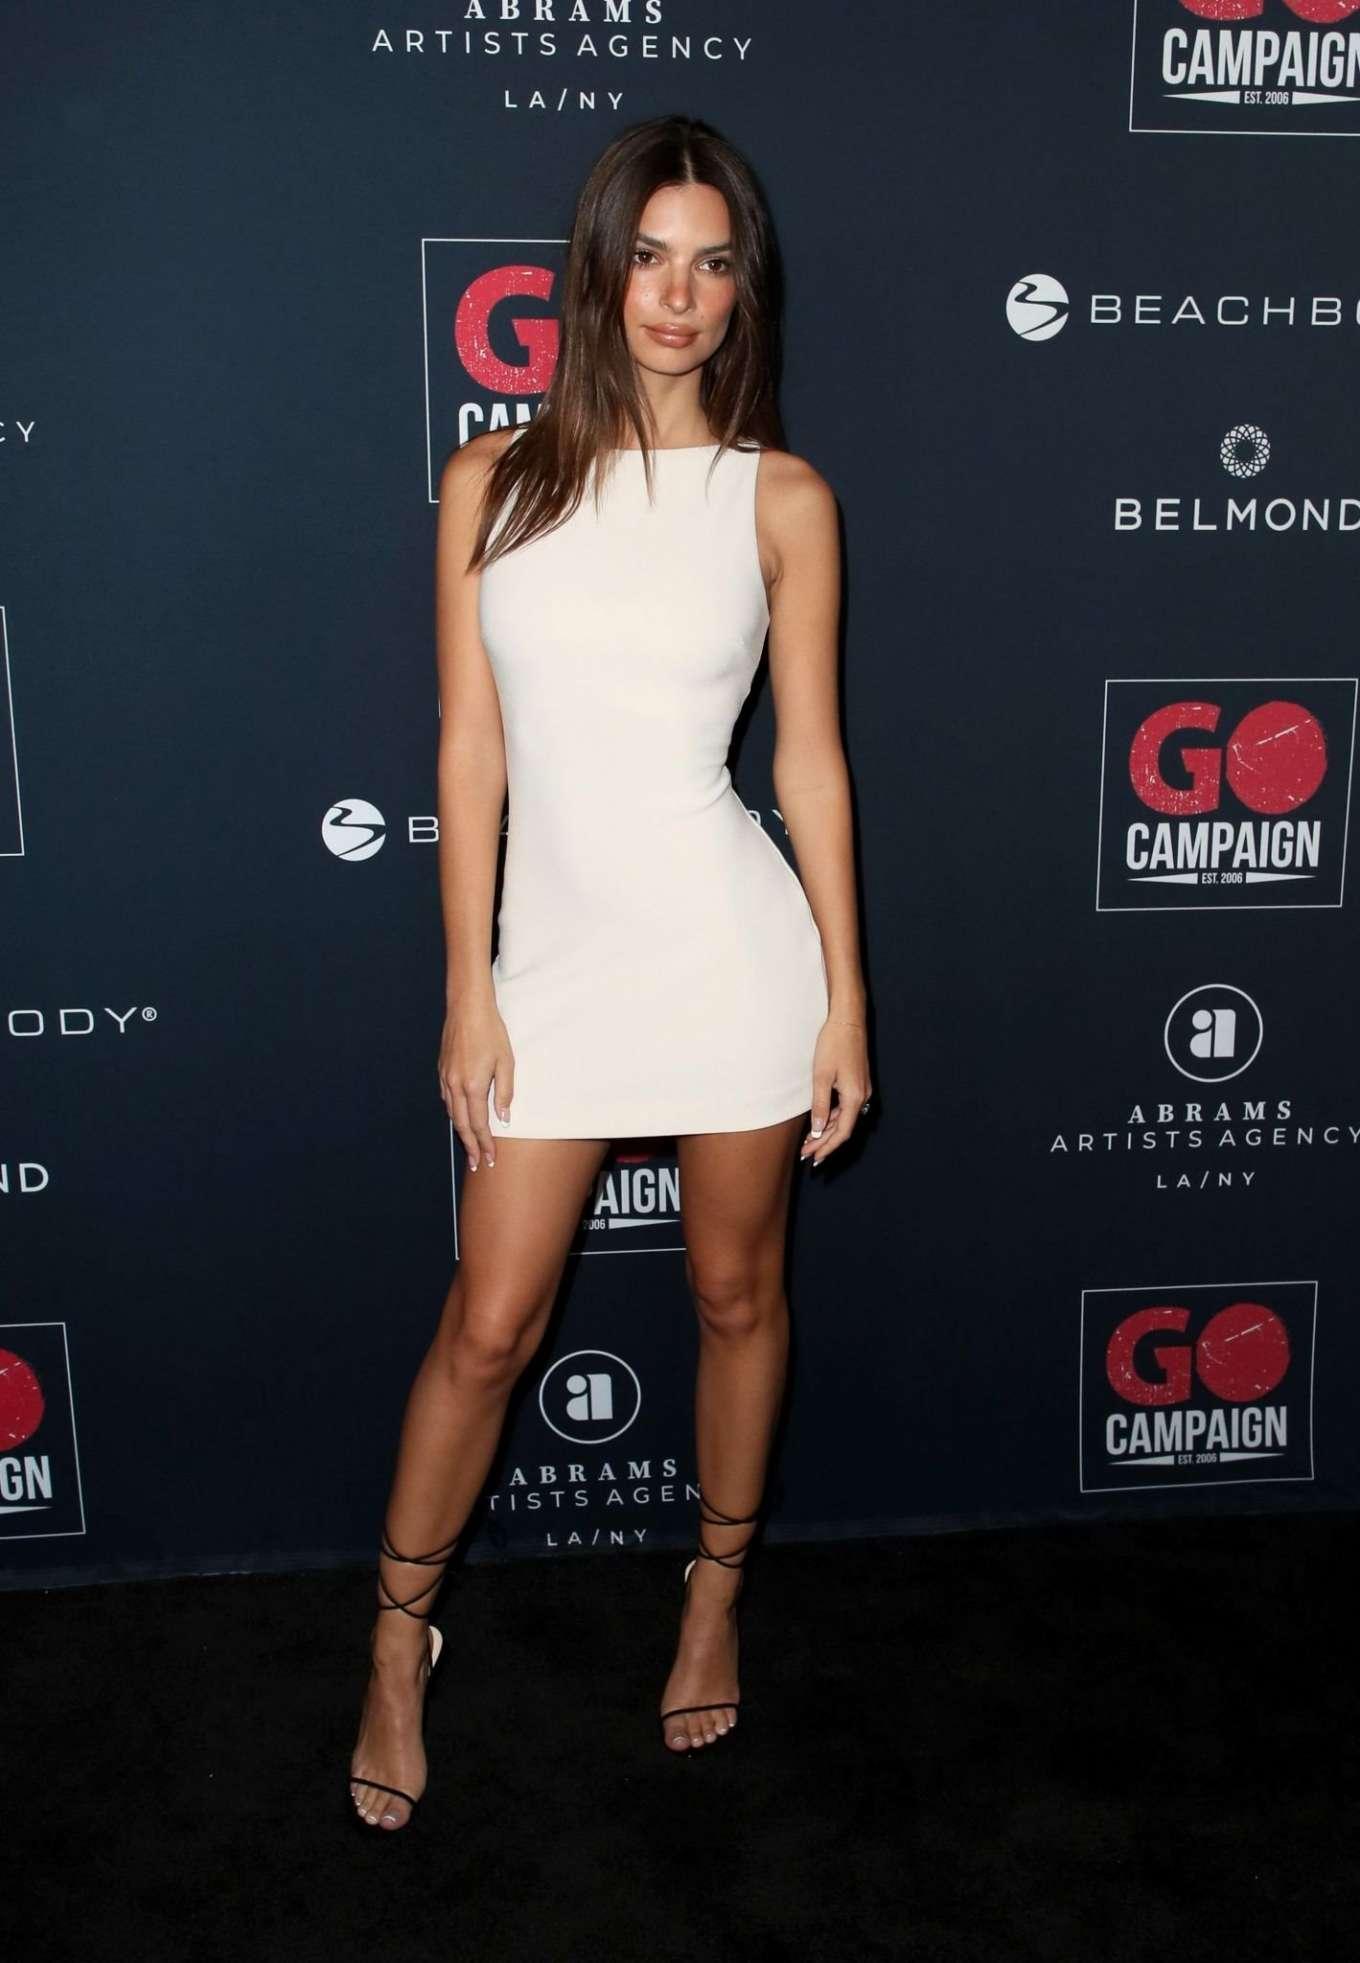 Emily Ratajkowski 2019 : Emily Ratajkowski – Go Campaigns 2019 Go Gala in Los Angeles-11